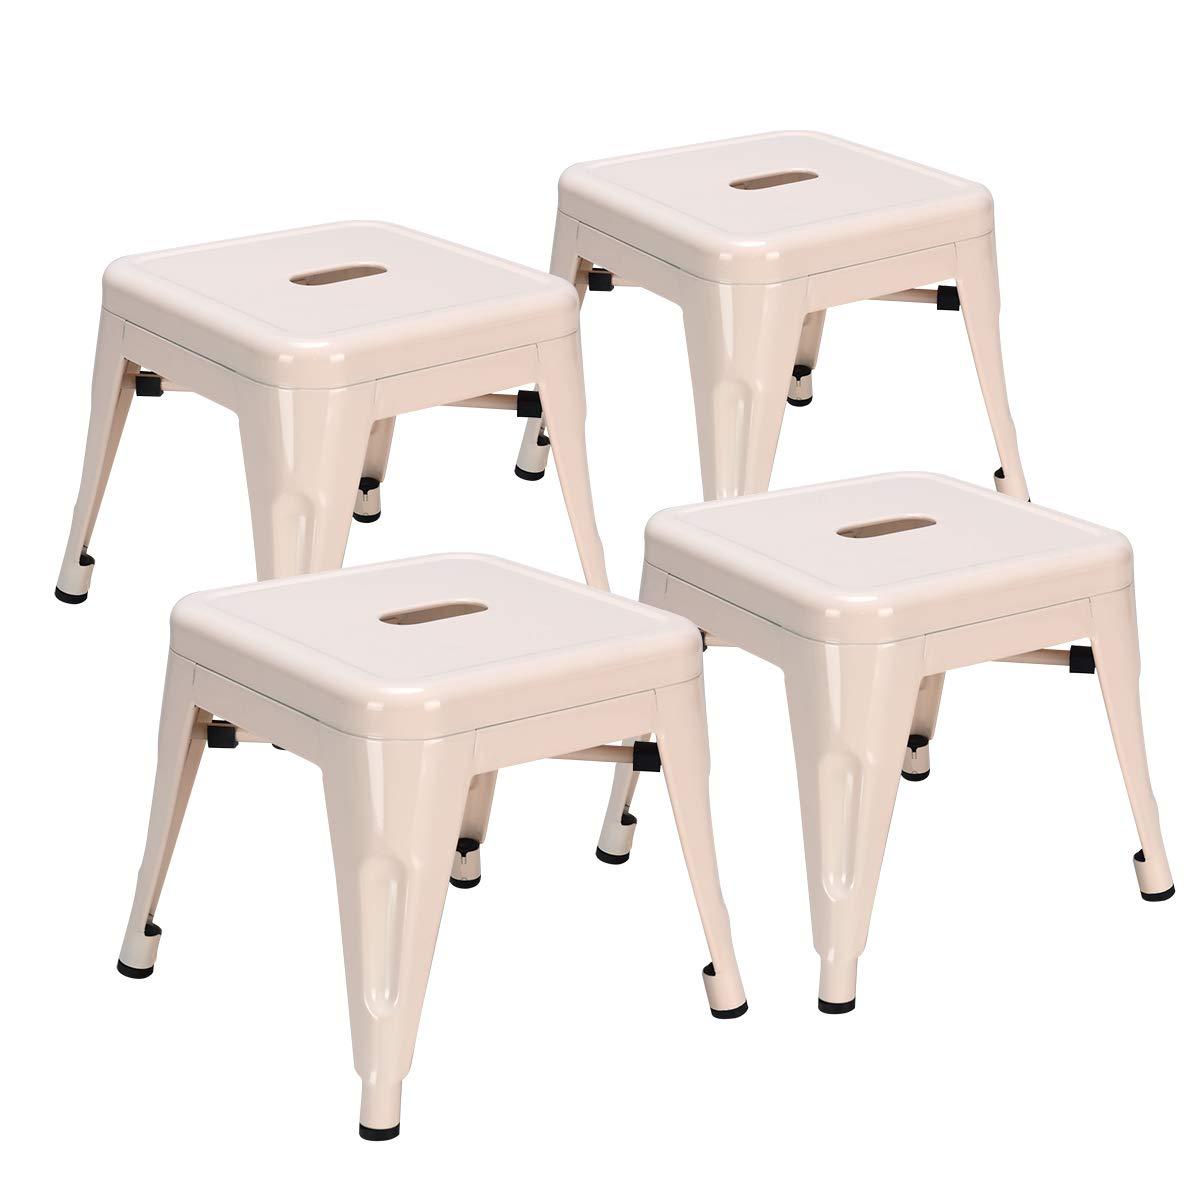 Costzon Kids Stackable Metal Stool, Children Toddlers Lightweight Compact Seat Furniture (Cream, Set of 4) by Costzon